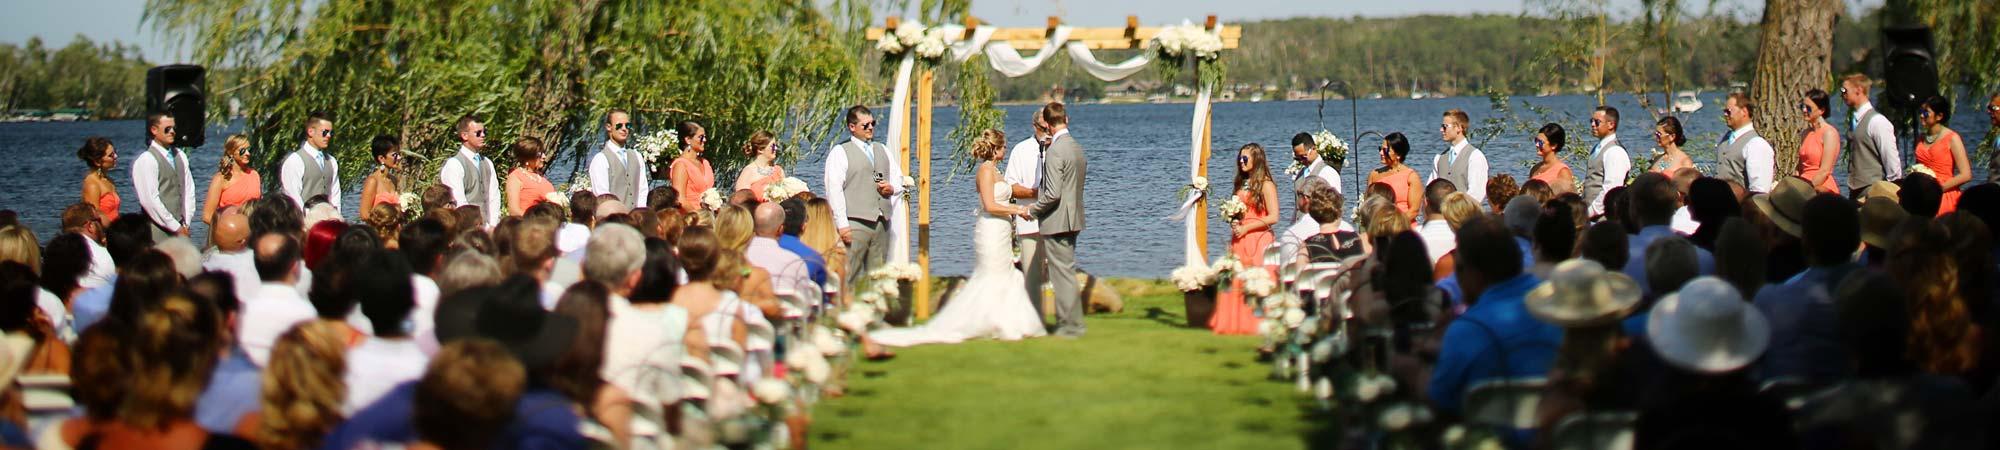 68-2817_Wedding_2000x450_Sliders_C1